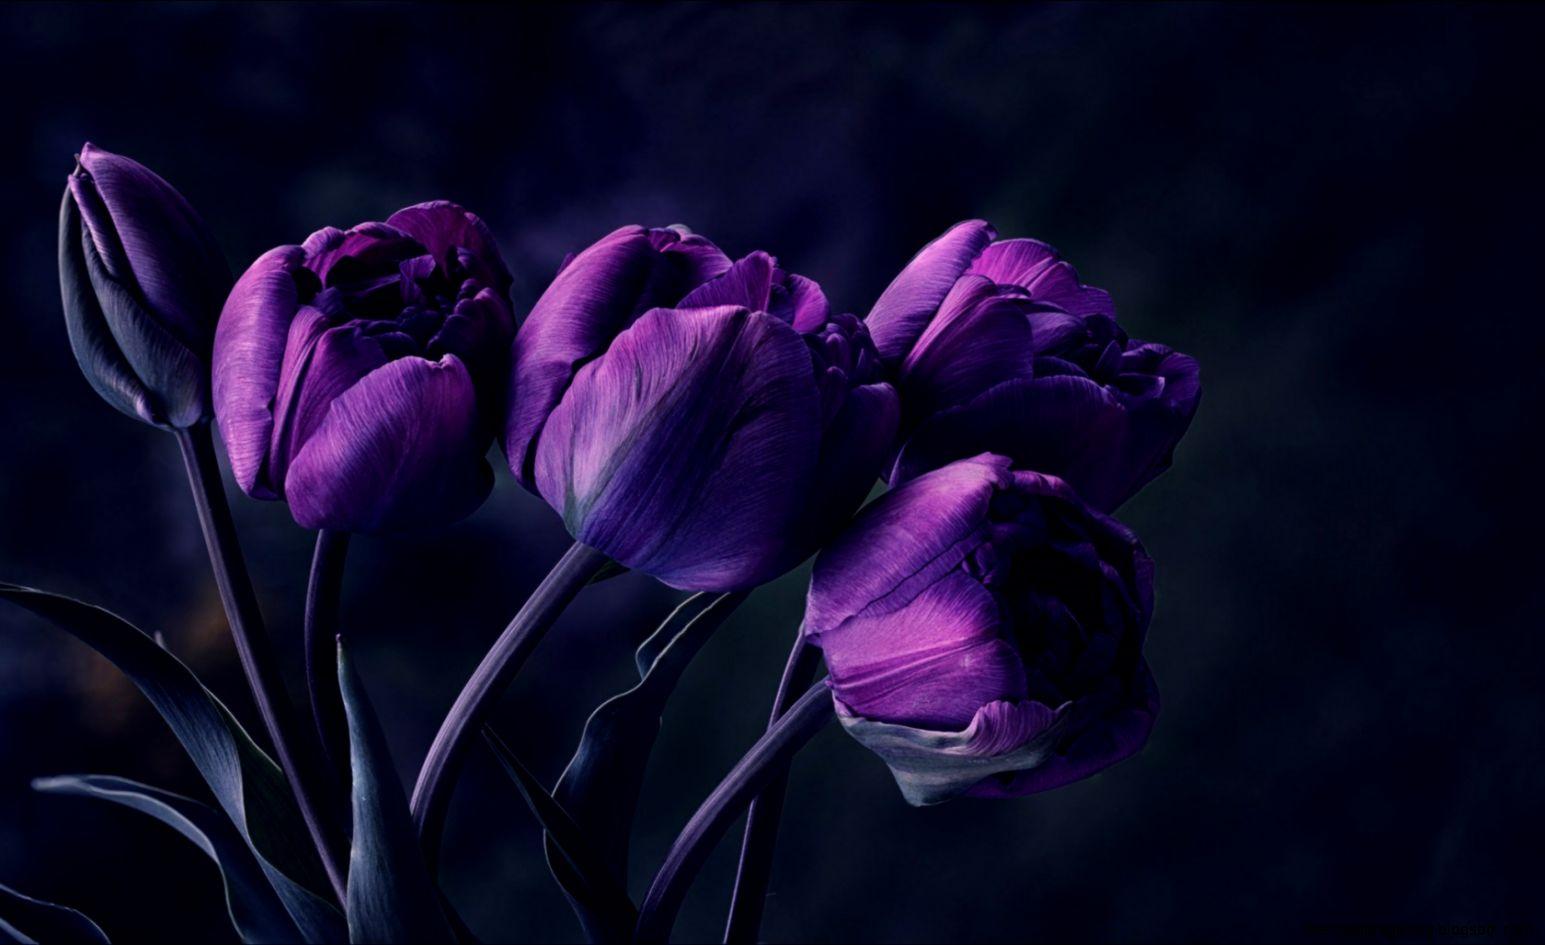 Purple Tulips Wallpapers Gallery